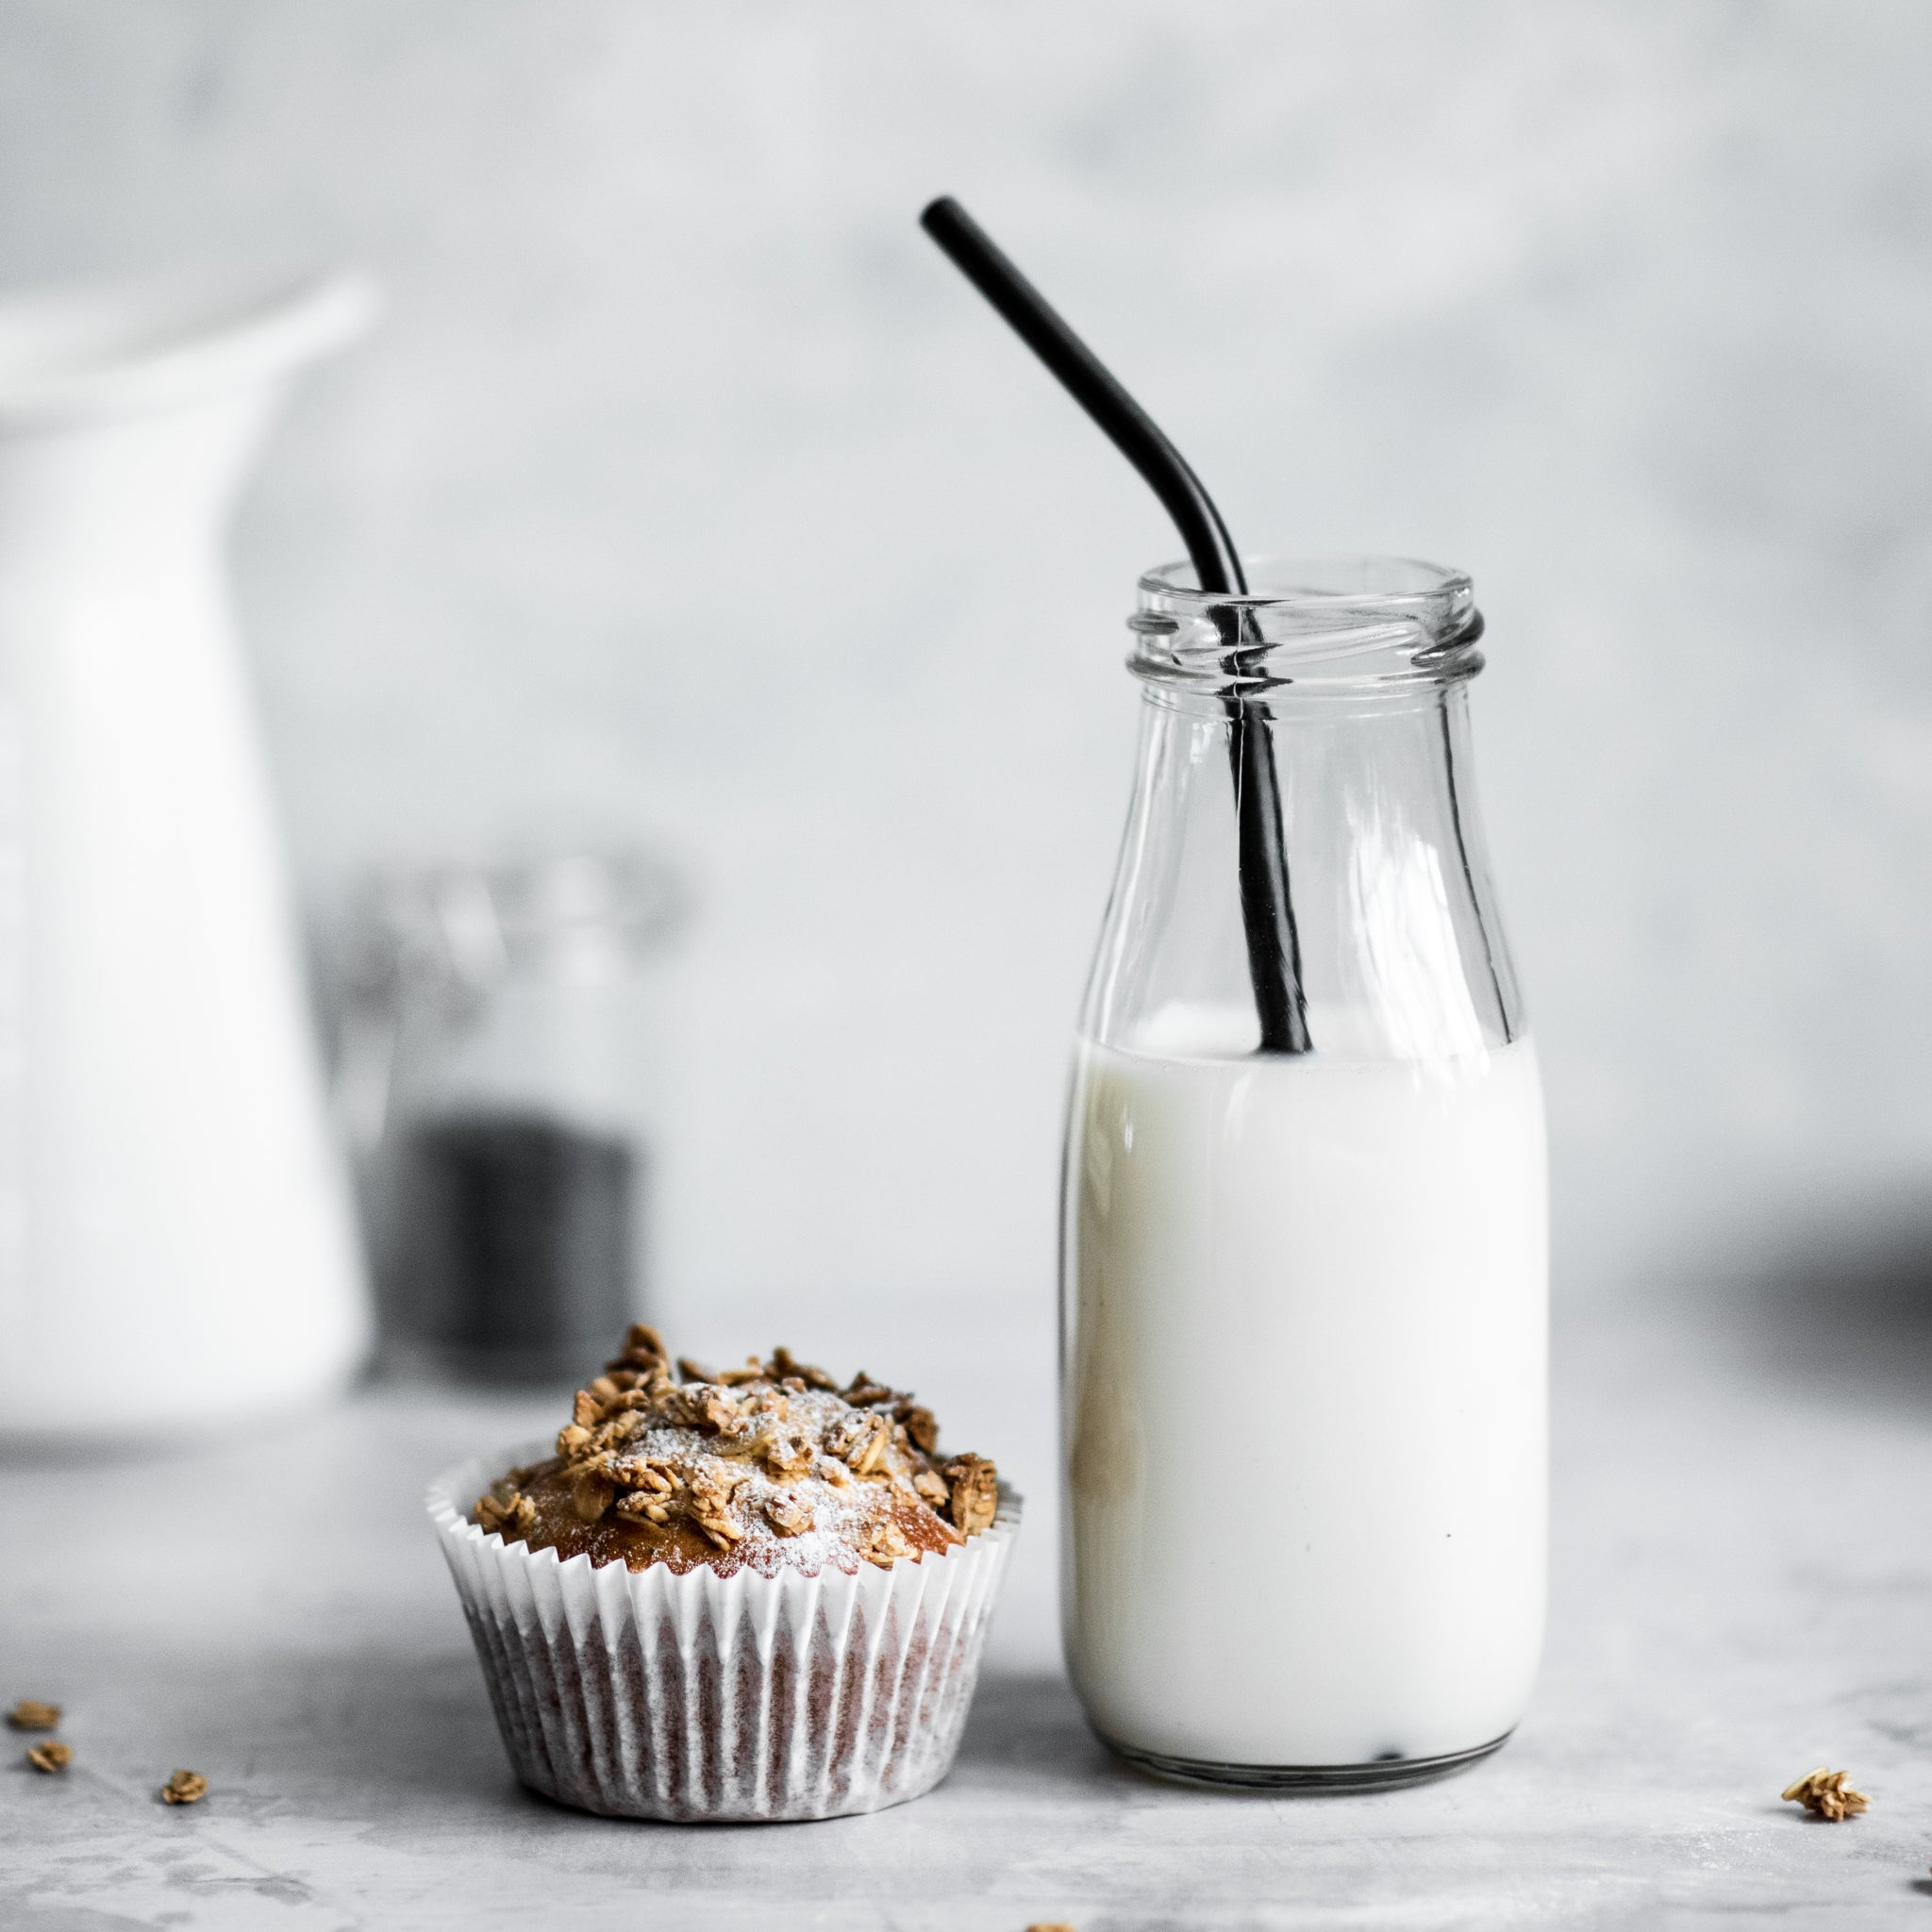 Granola-Breakfast-Muffins-SQUARE-12.jpg